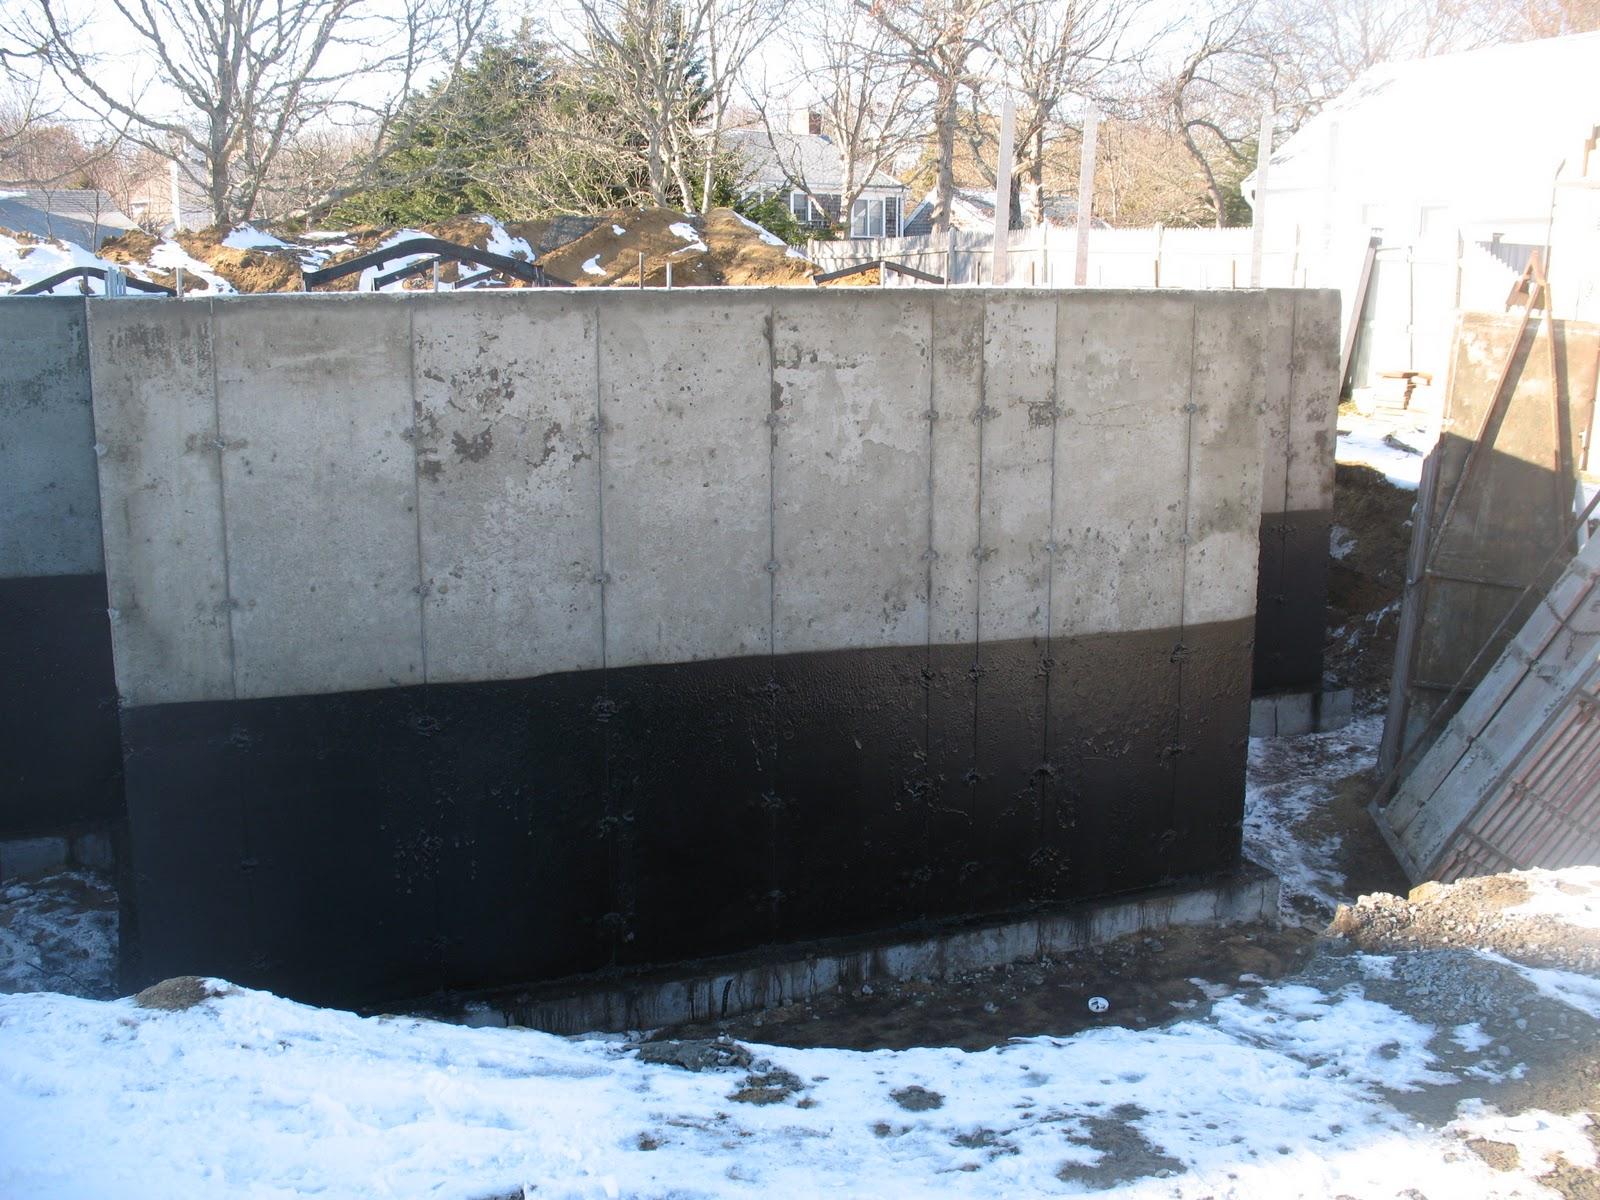 Foundation Damp Proofing Walls : Net zero energy cape cod foundation walls damp proofing